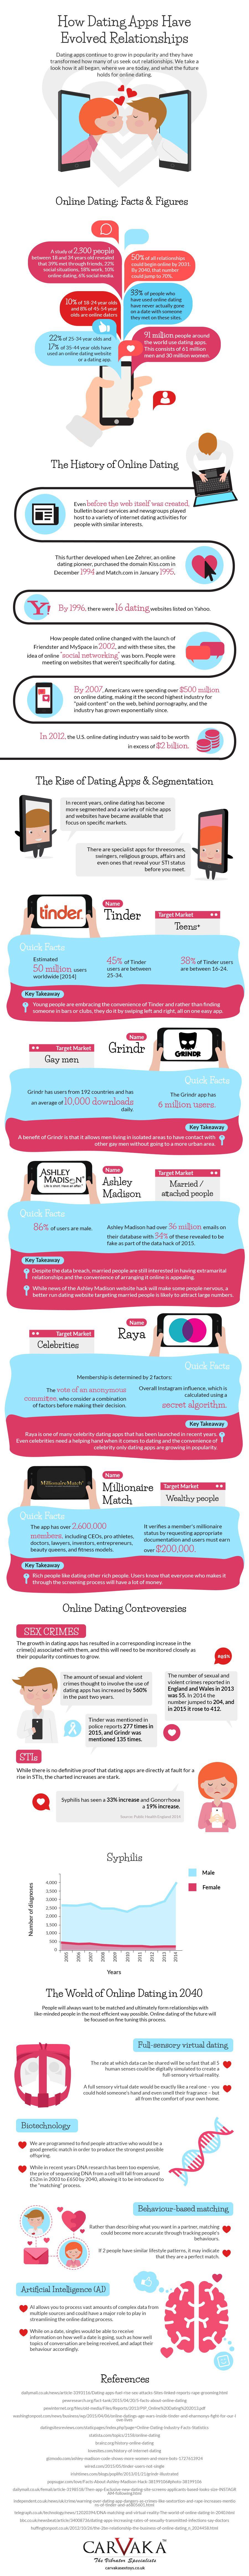 Online Dating has Evolved Relationships (UK)